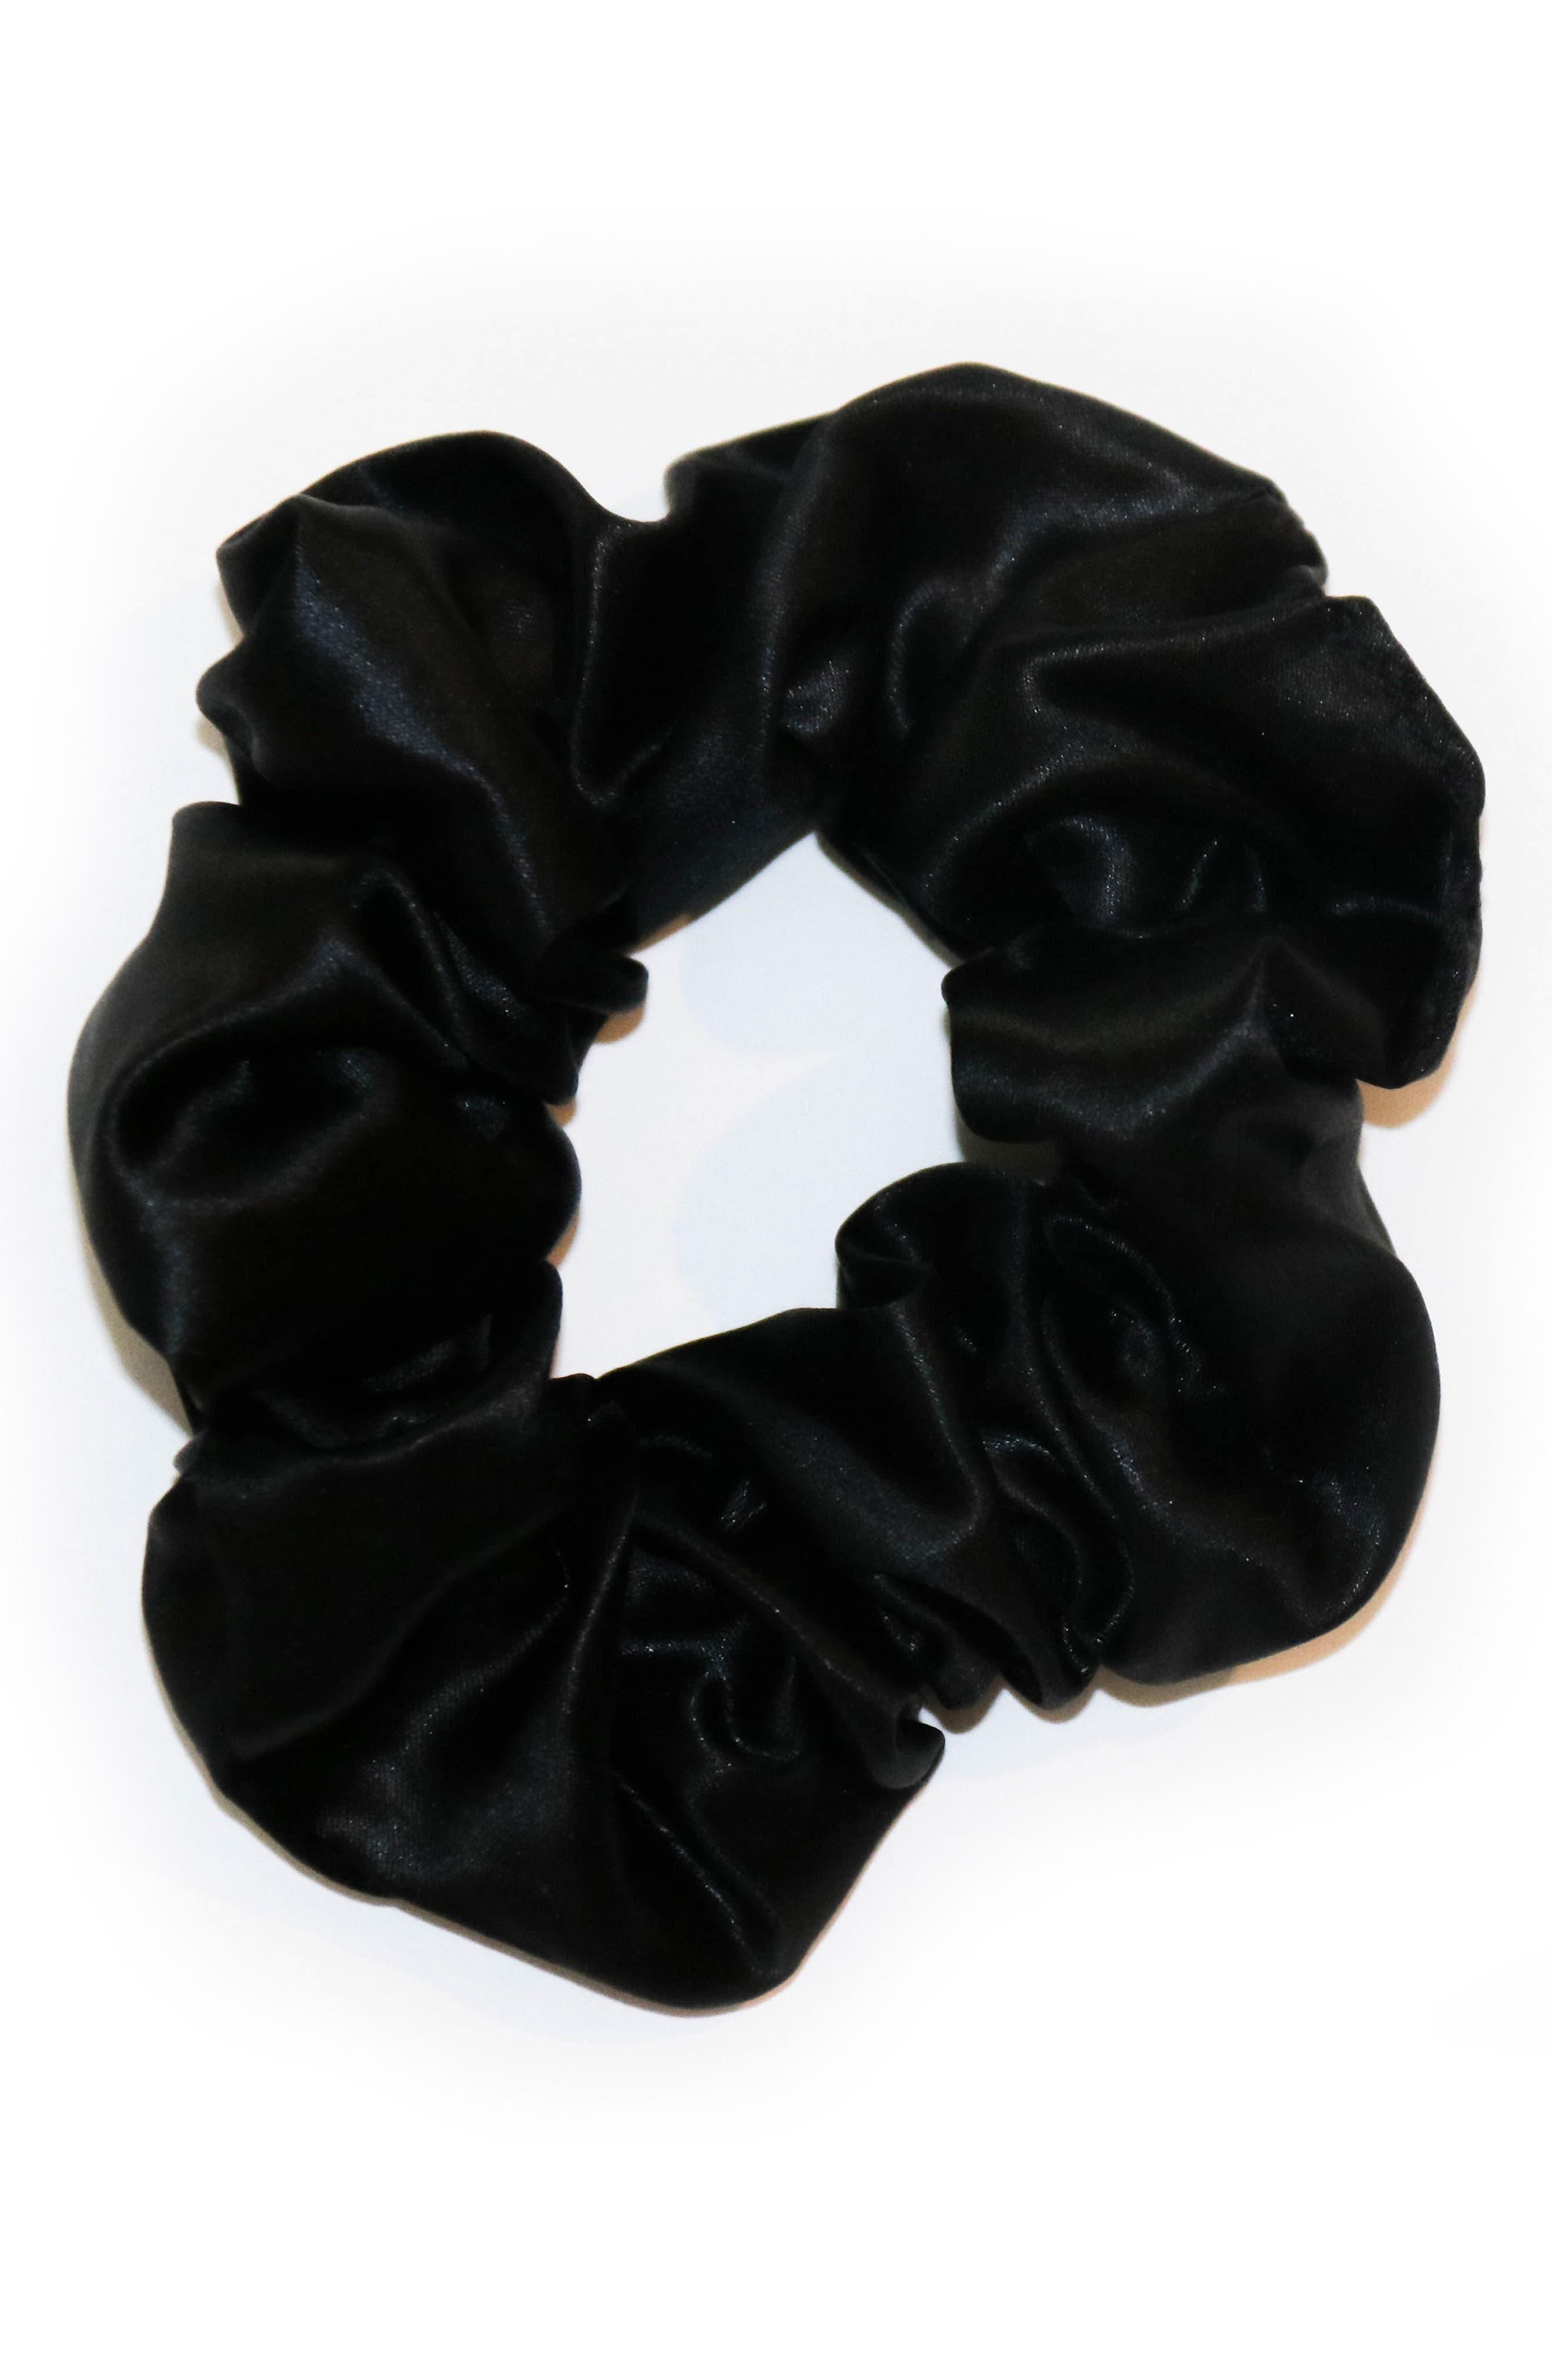 SLIP FOR BEAUTY SLEEP, slip<sup>™</sup> for beauty sleep 3-Pack Slipsilk<sup>™</sup> Hair Ties, Alternate thumbnail 2, color, BLACK